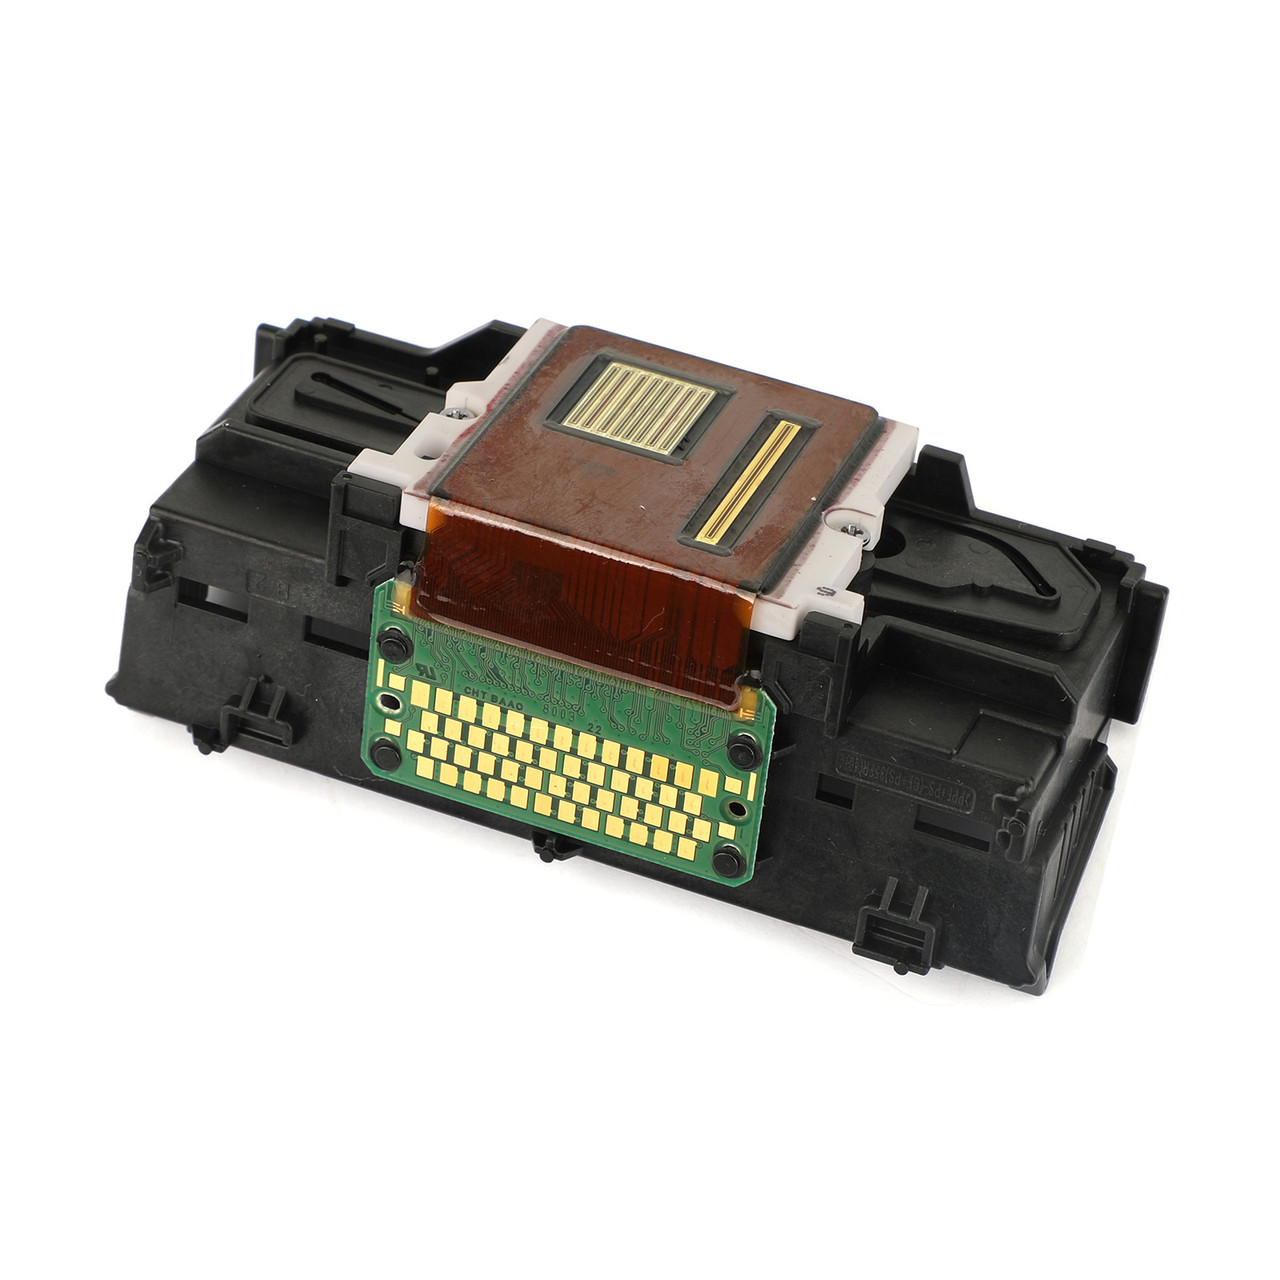 Replacement Printer Print Head QY6-0090 For TS8020 TS9020 TS8040 8050 8070 8080